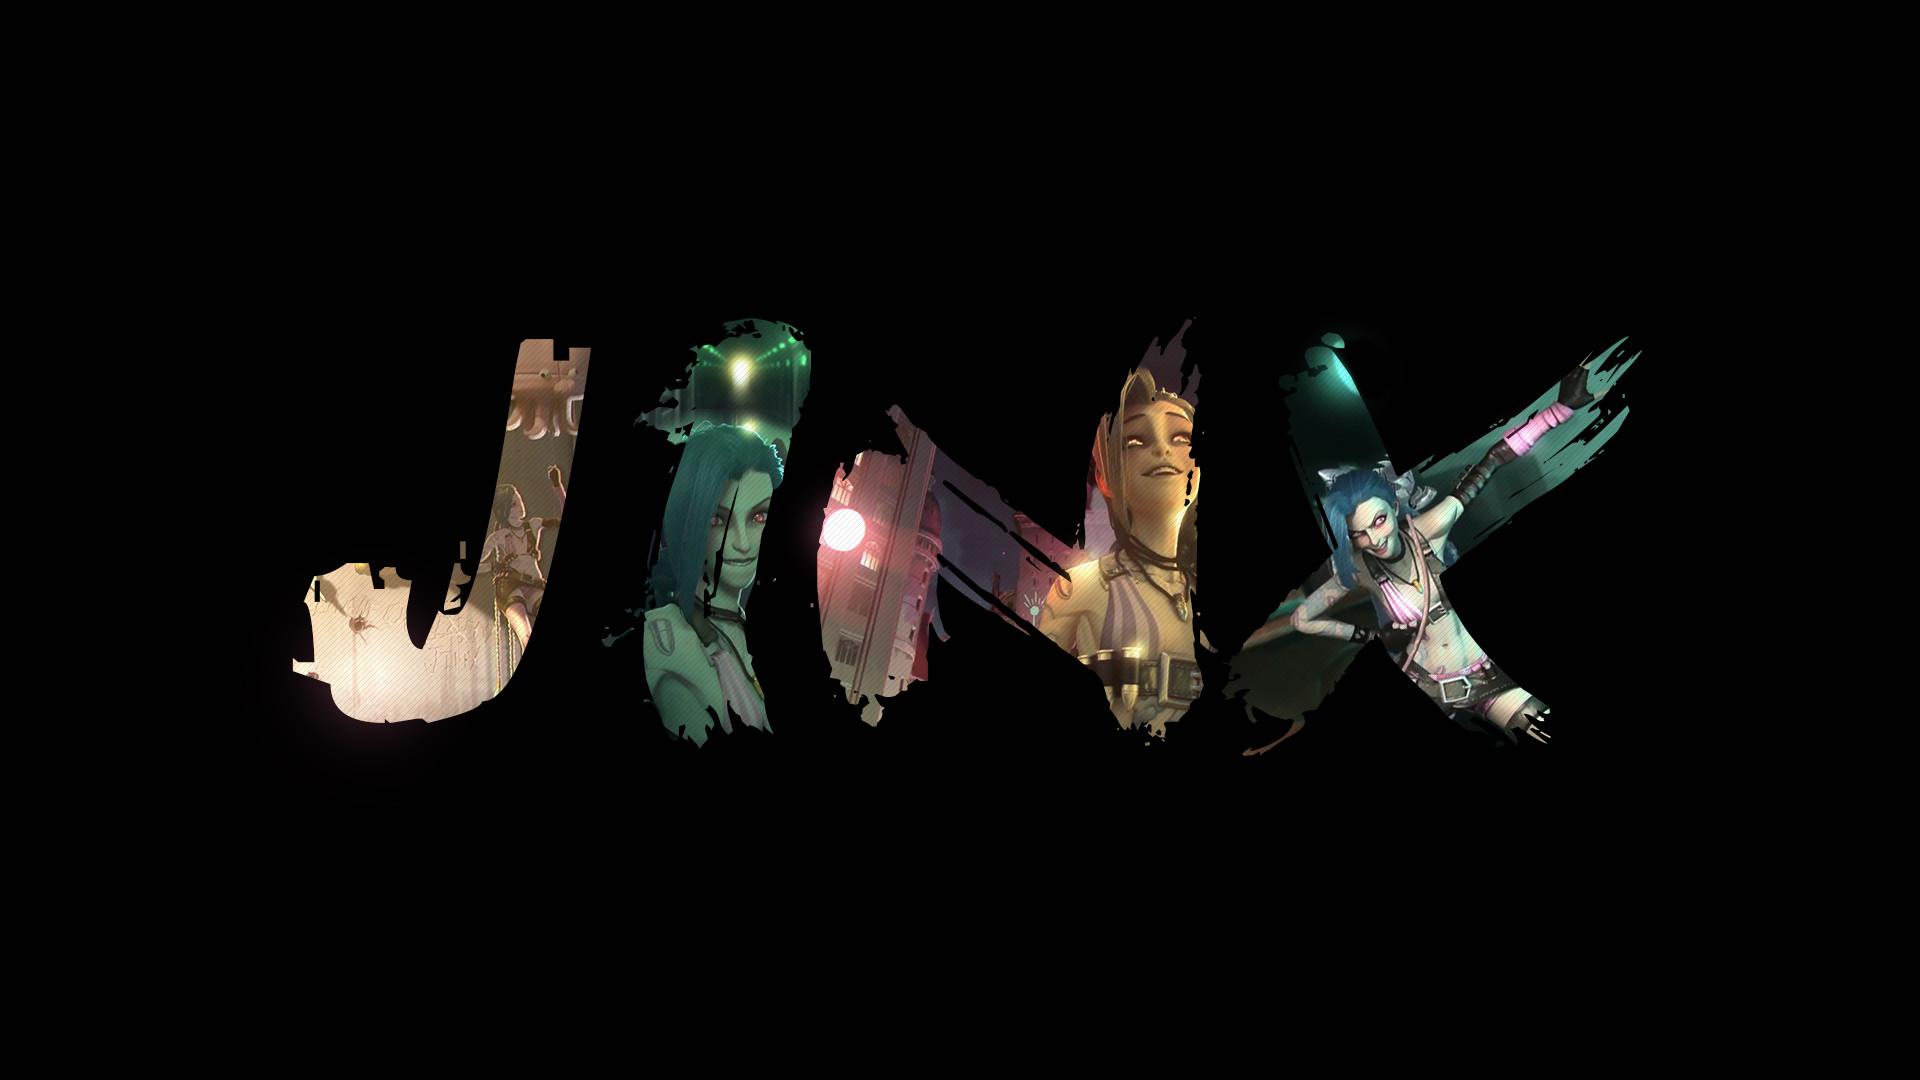 … League of Legends Jinx Wallpaper by ViciousBlue